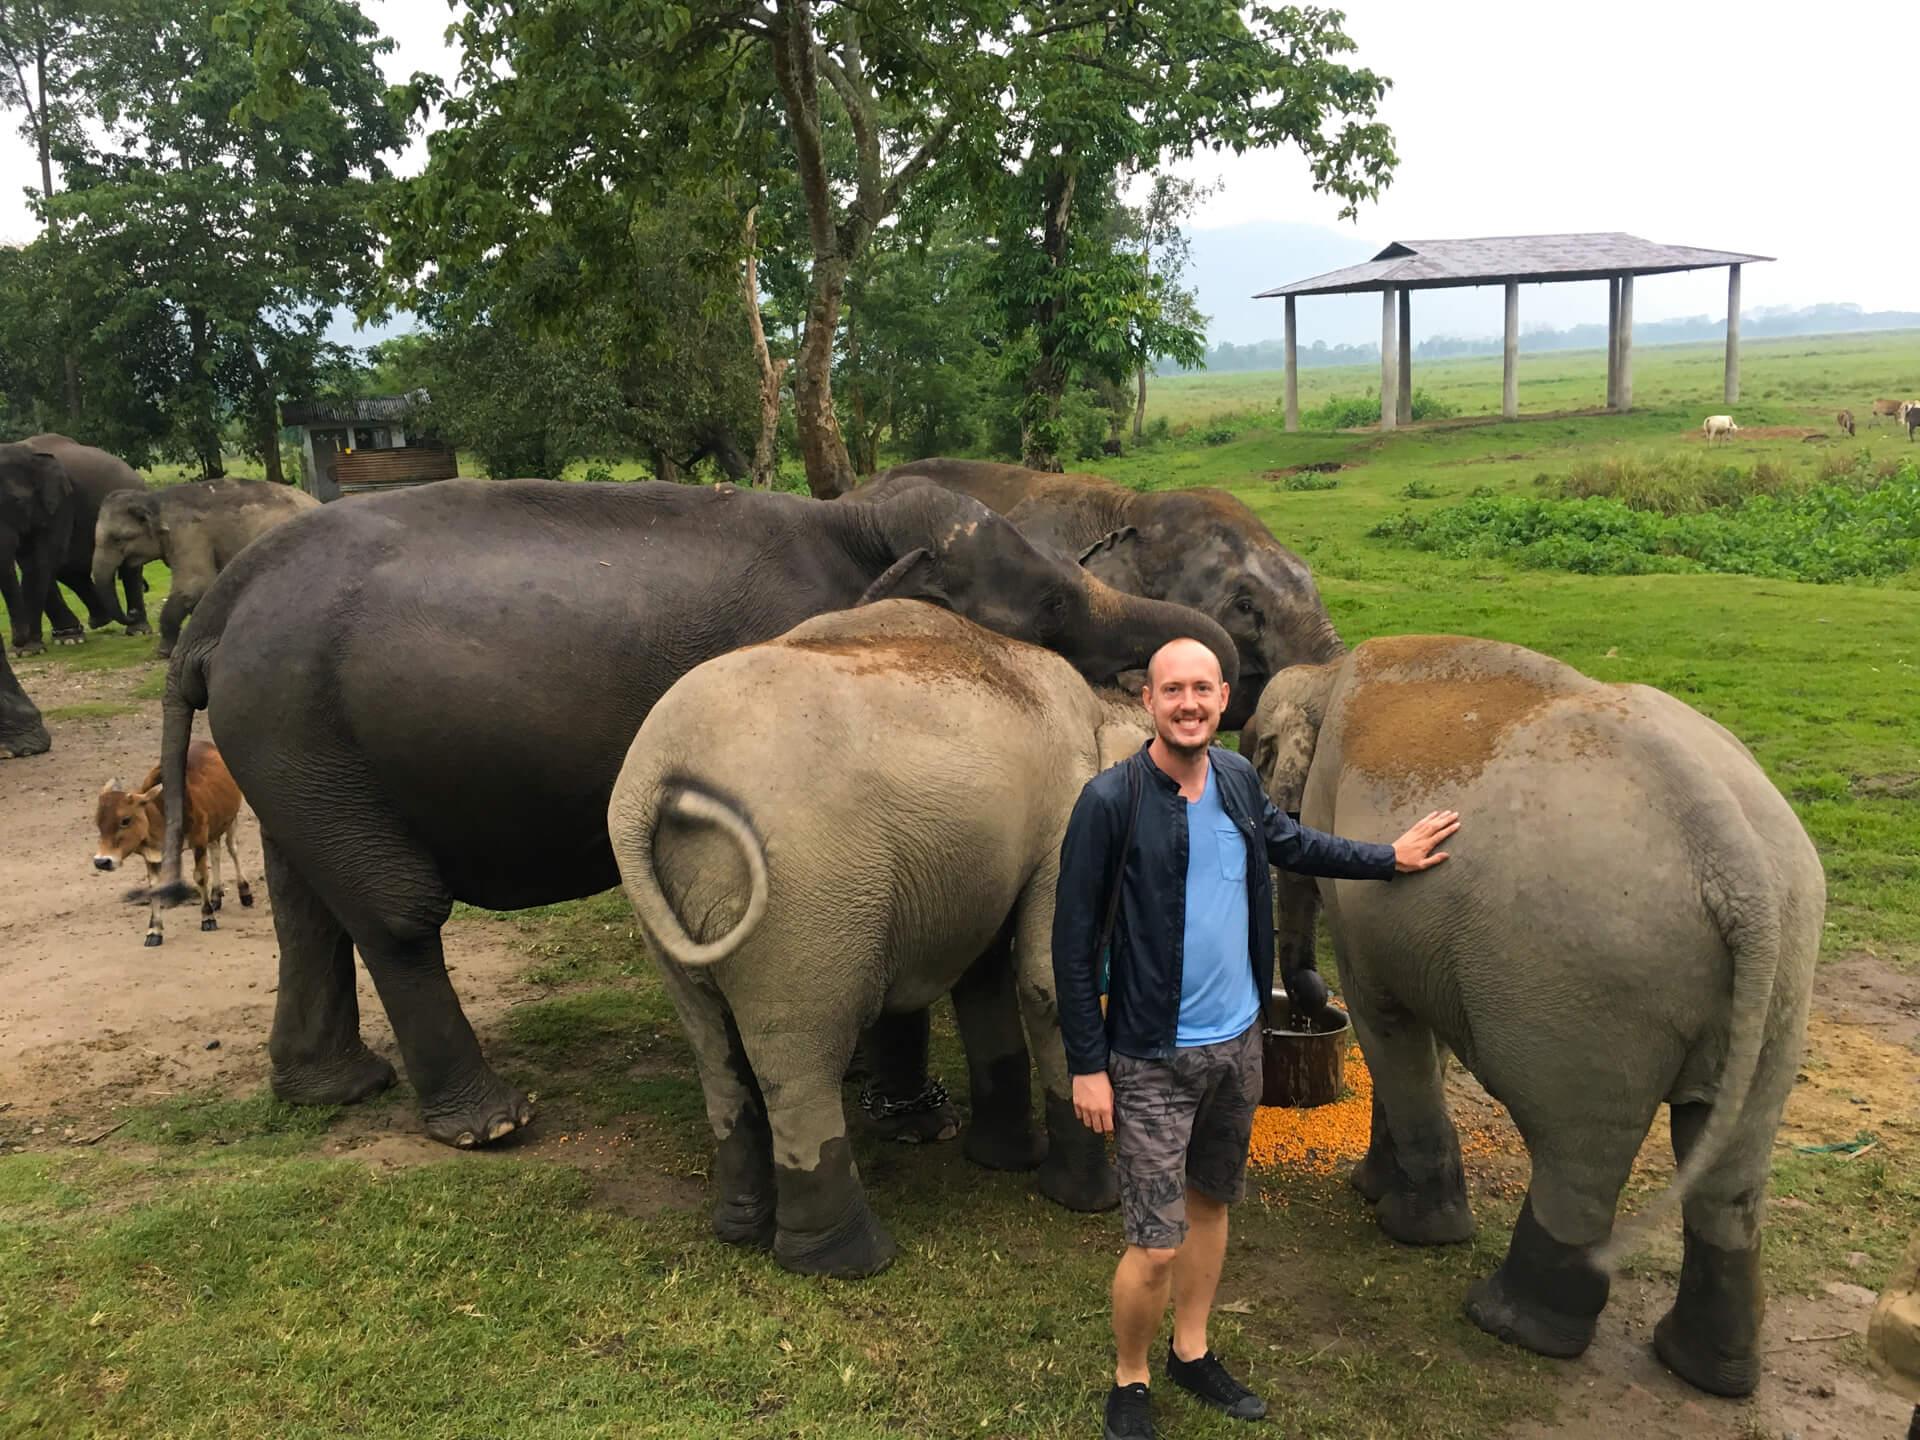 Me standing with three elephants.